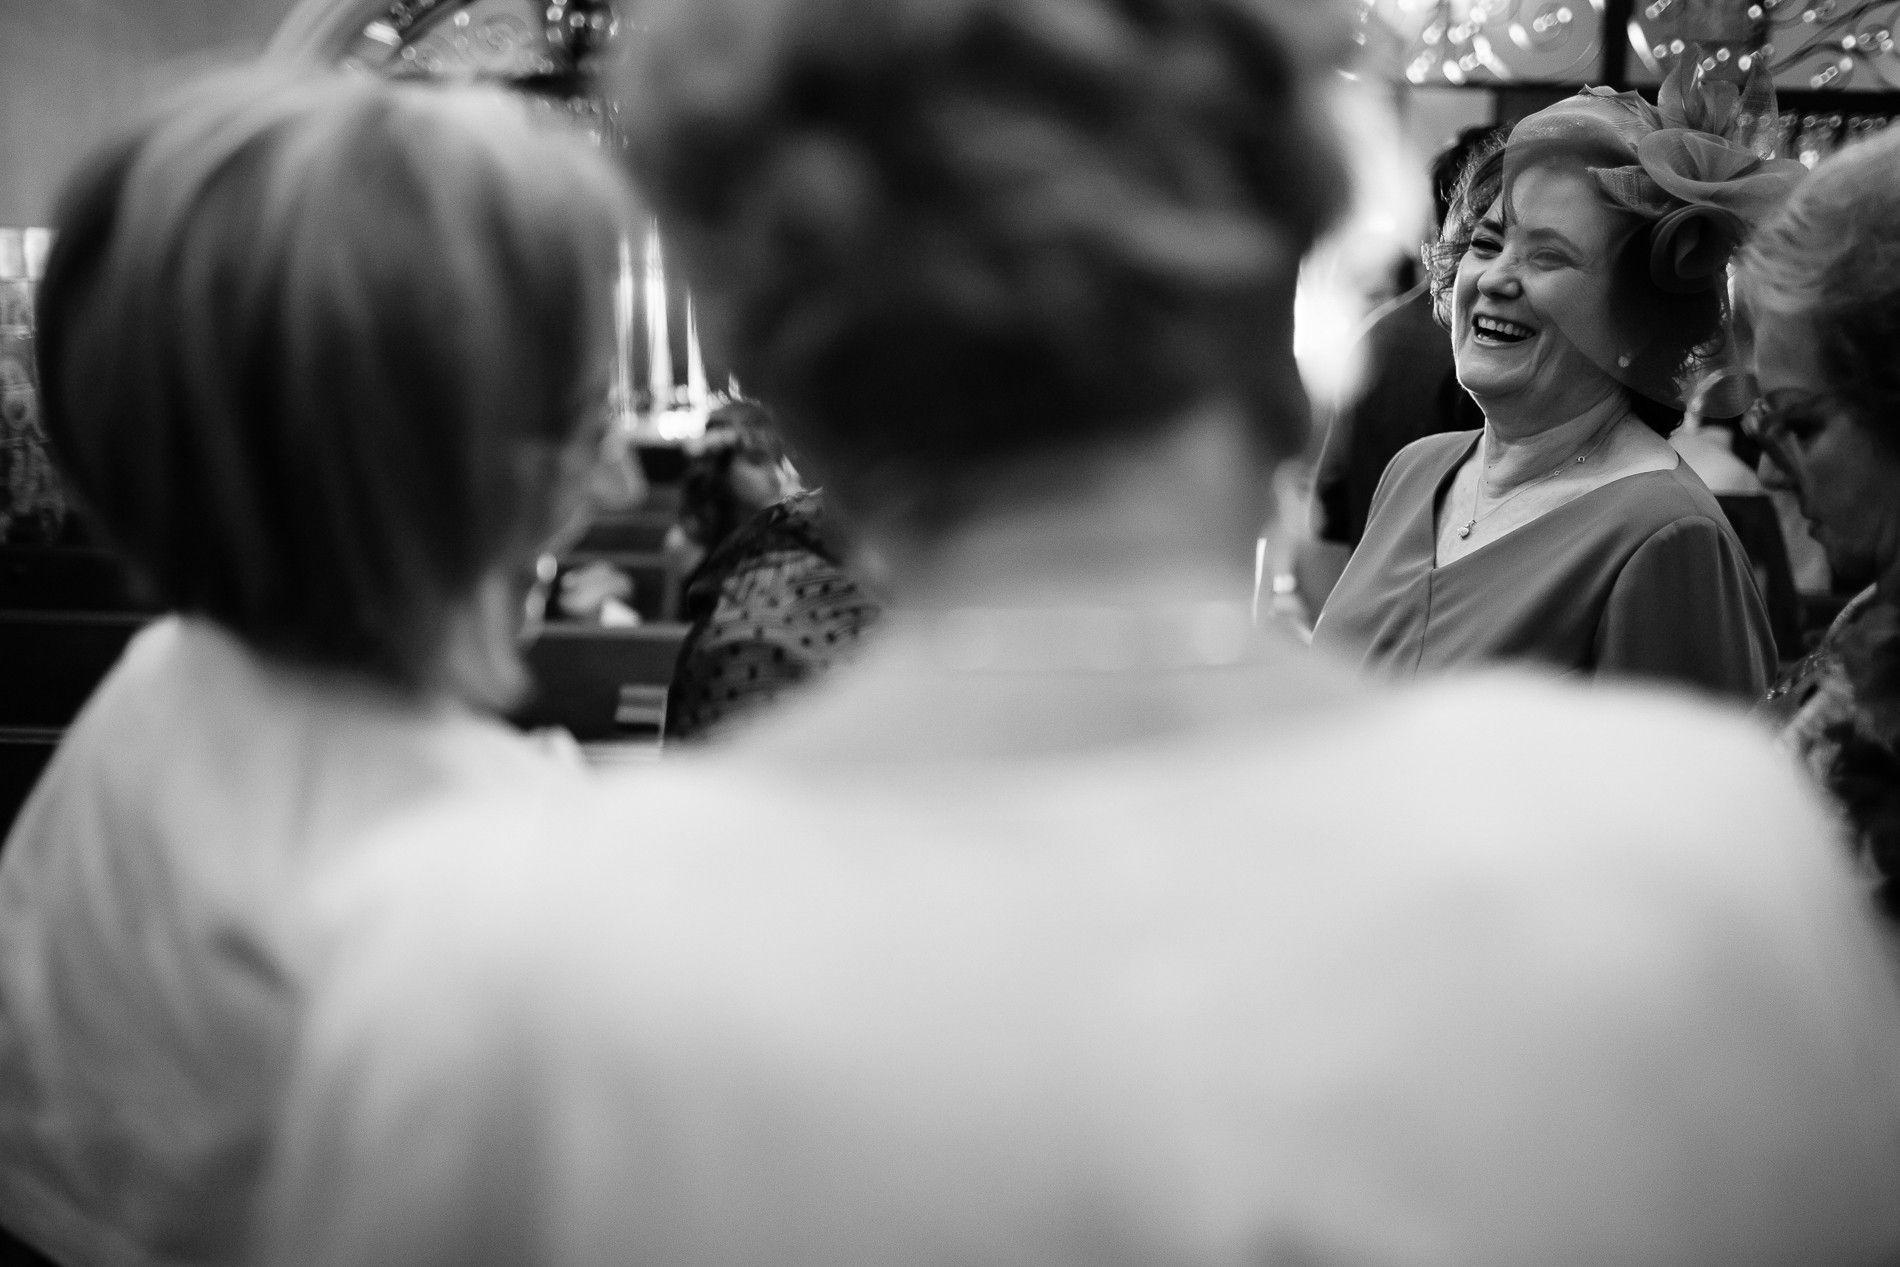 fotografo-de-boda-plasencia-11